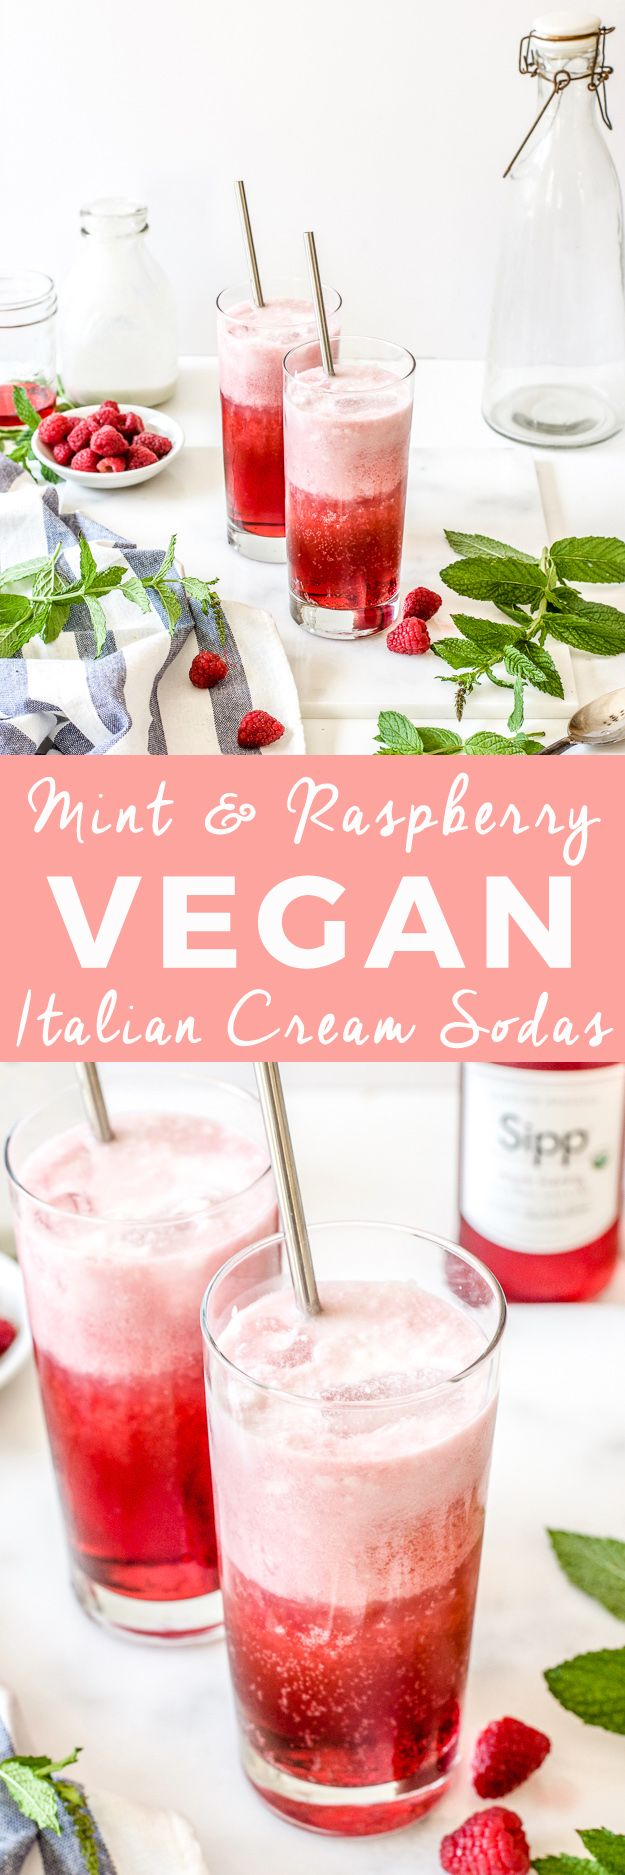 Mint Blackberry Raspberry Vegan Italian Cream Sodas